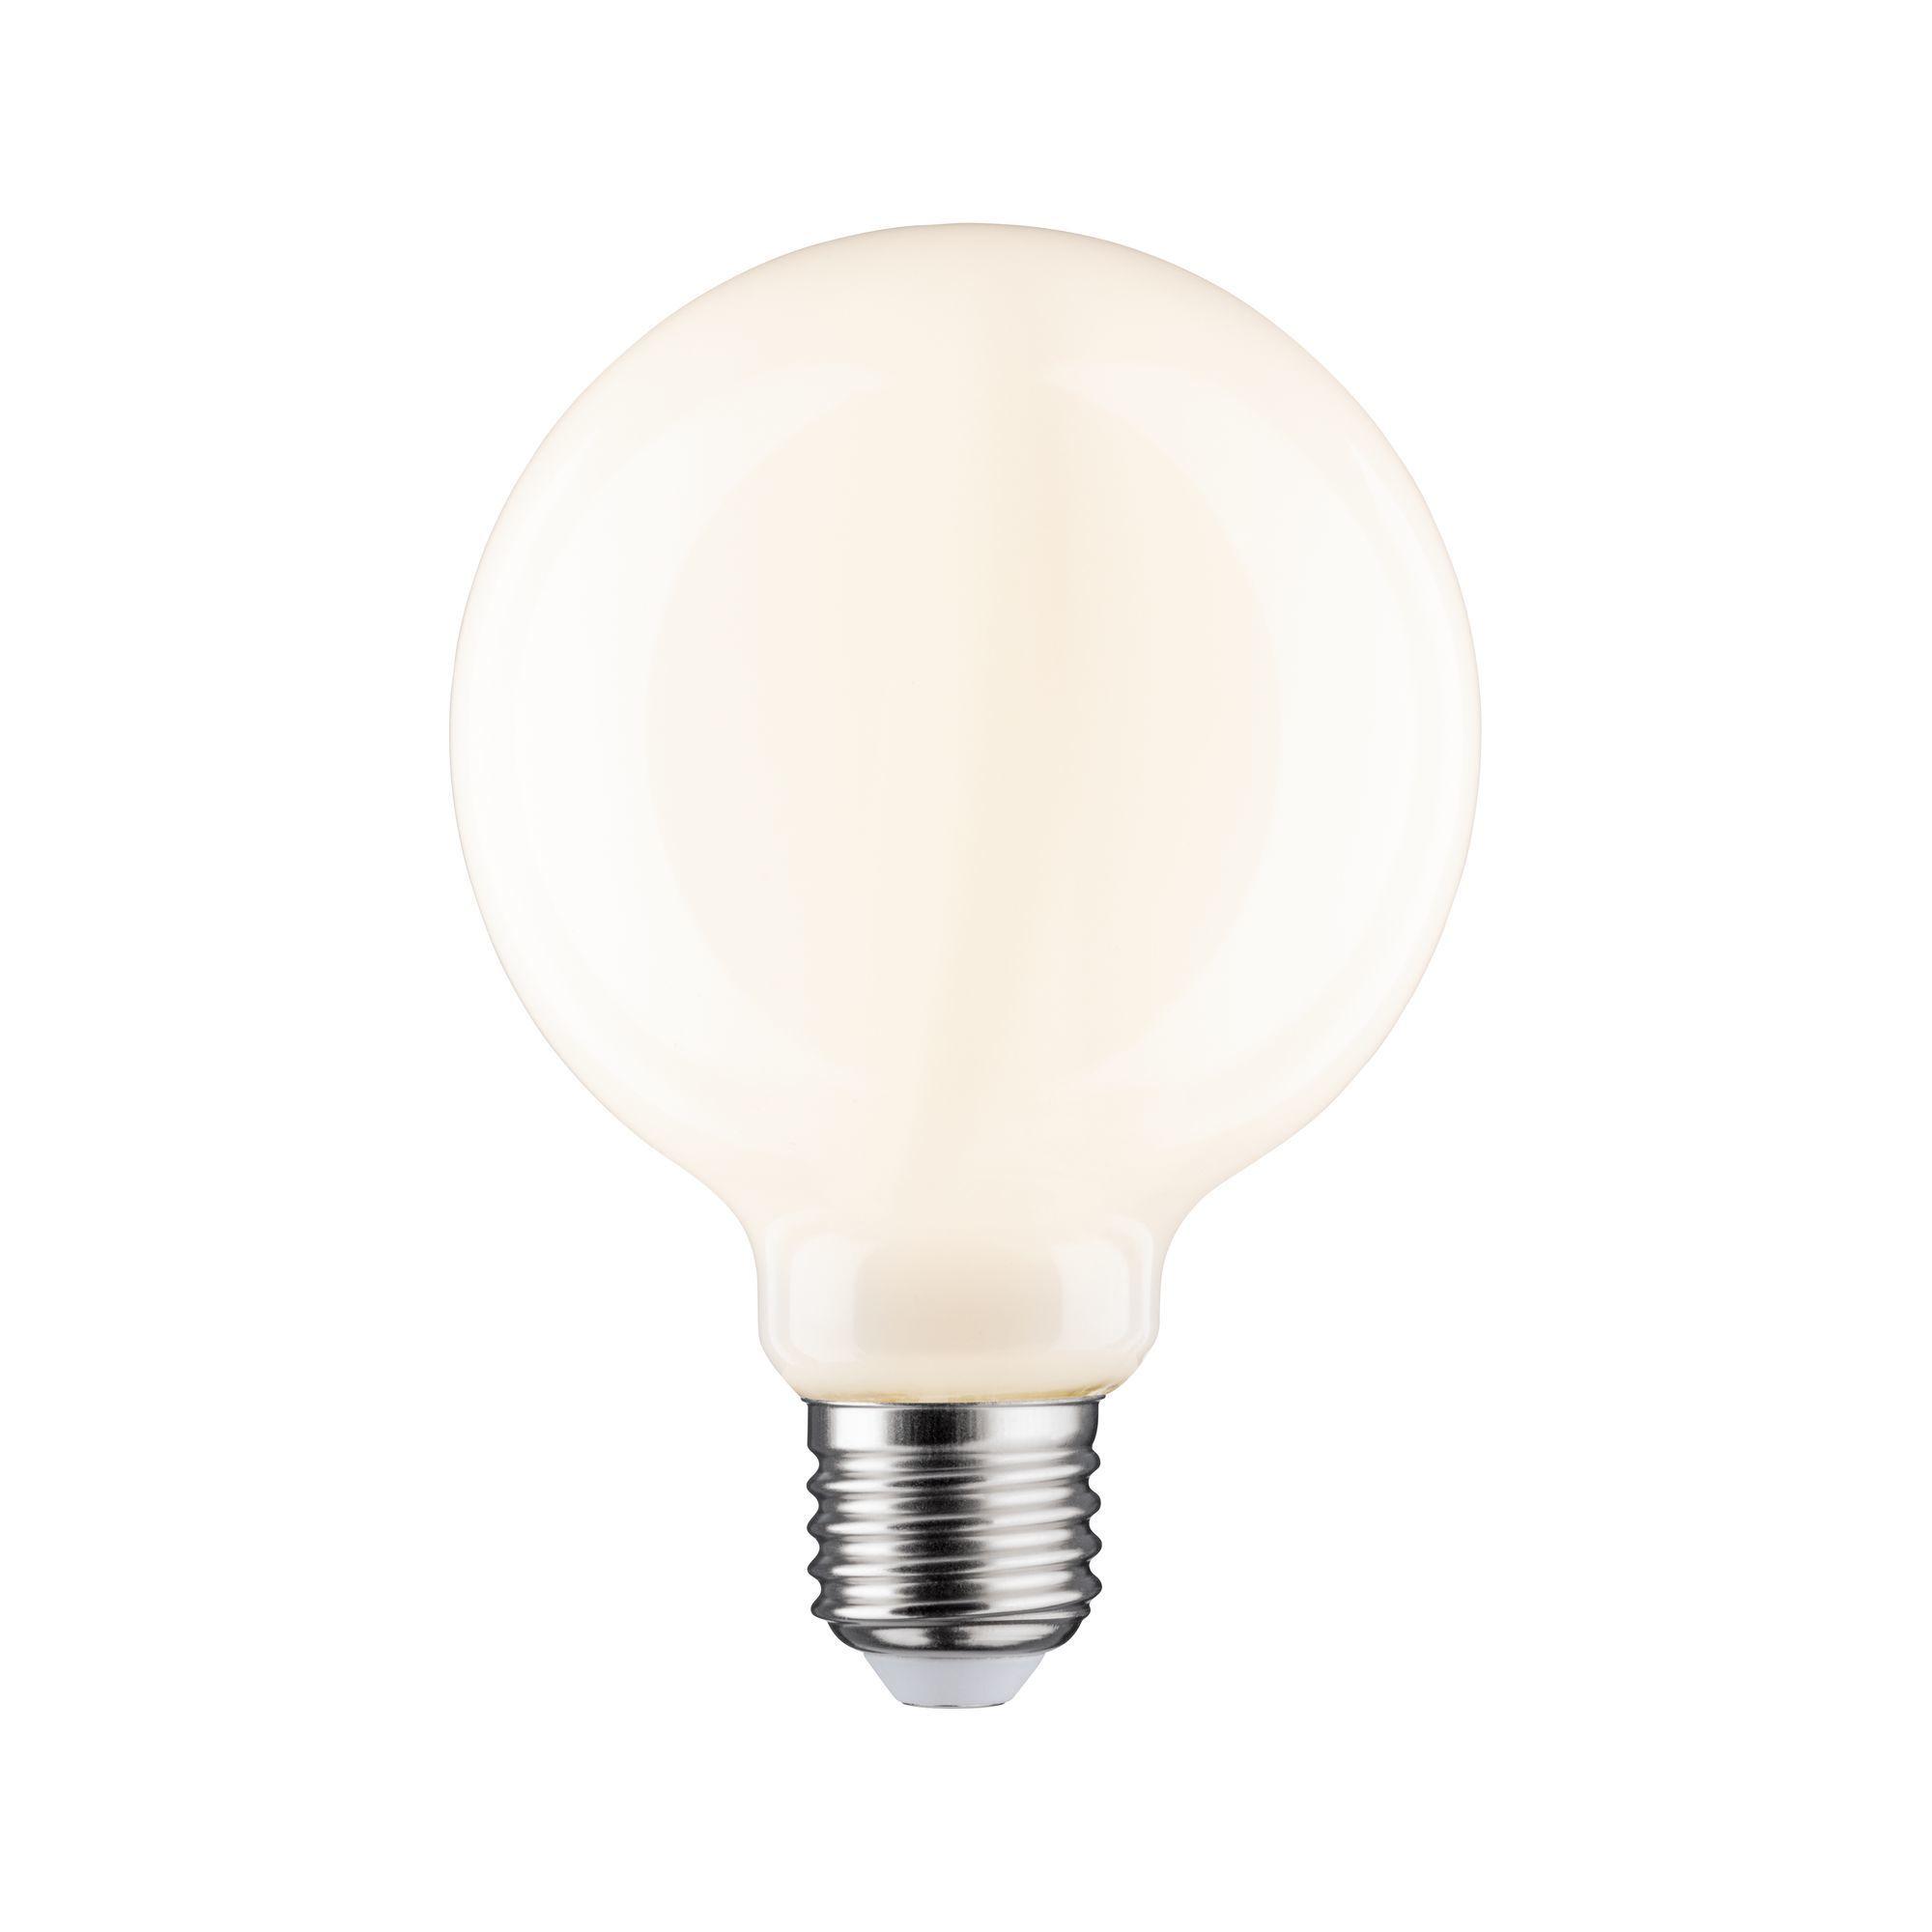 Paulmann LED Fil G95 1055lm E27 2700K opal dim 9W 230V (28625)